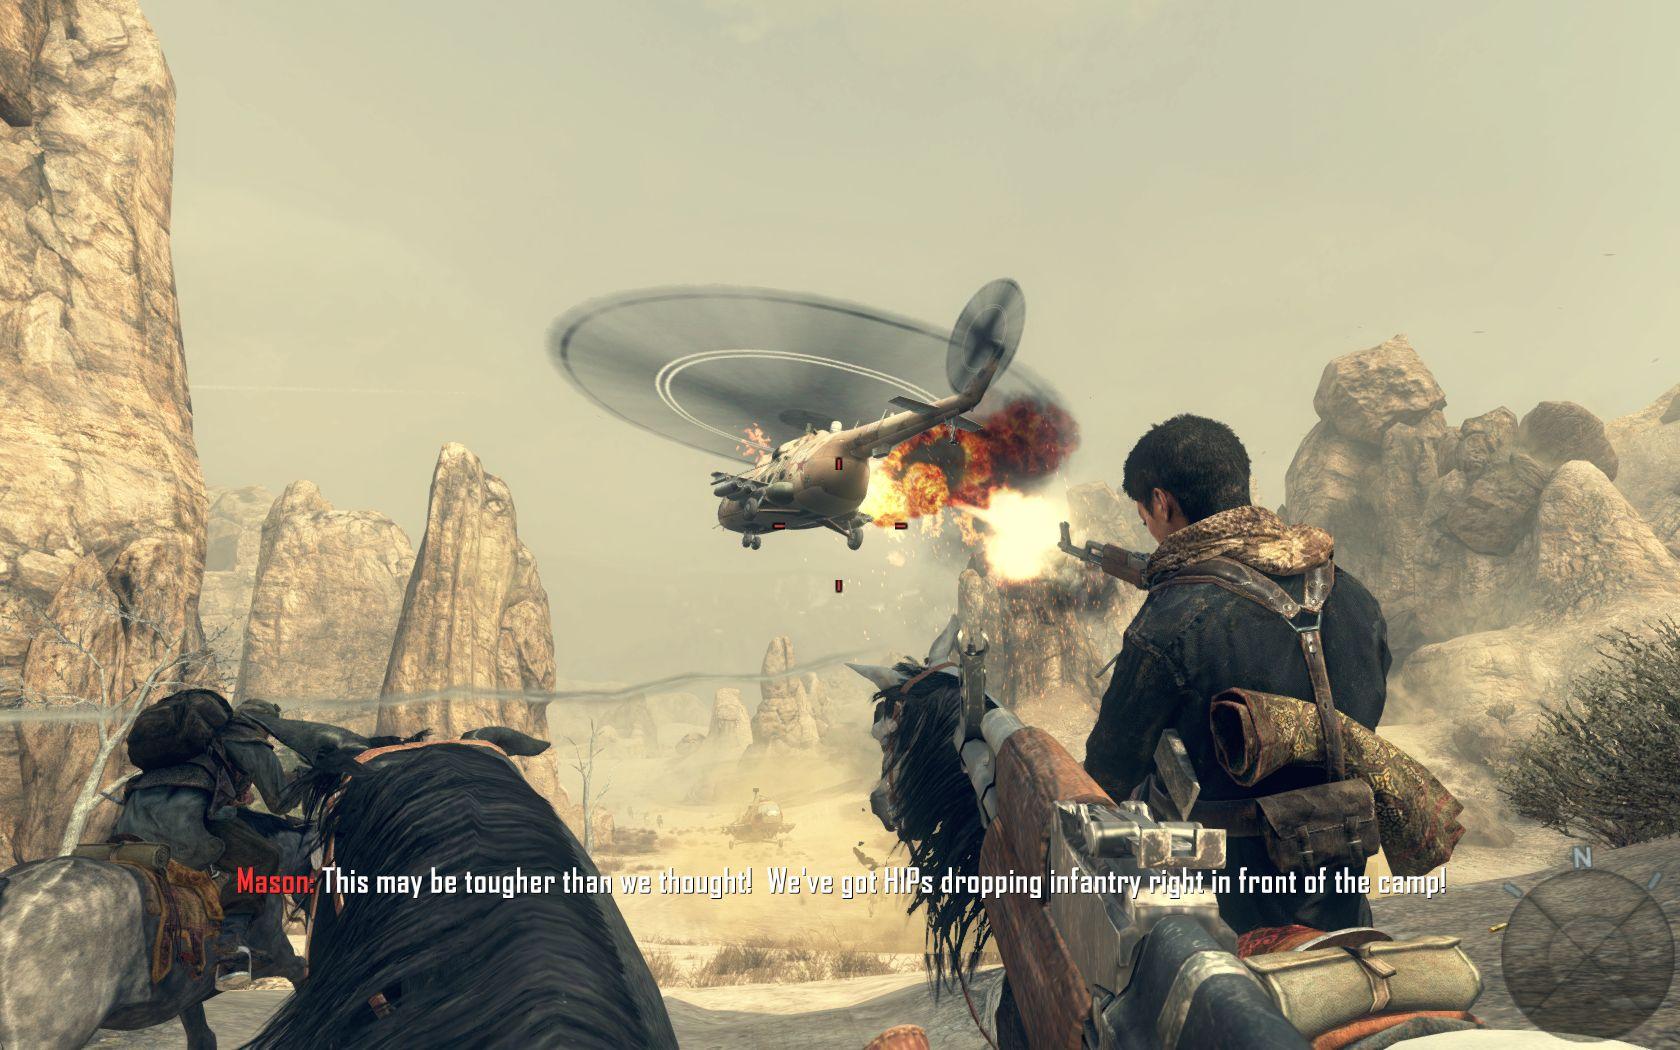 http://itc.ua/wp-content/uploads/2012/11/Call_of_Duty_Black_Ops_II_single_02_1.jpg